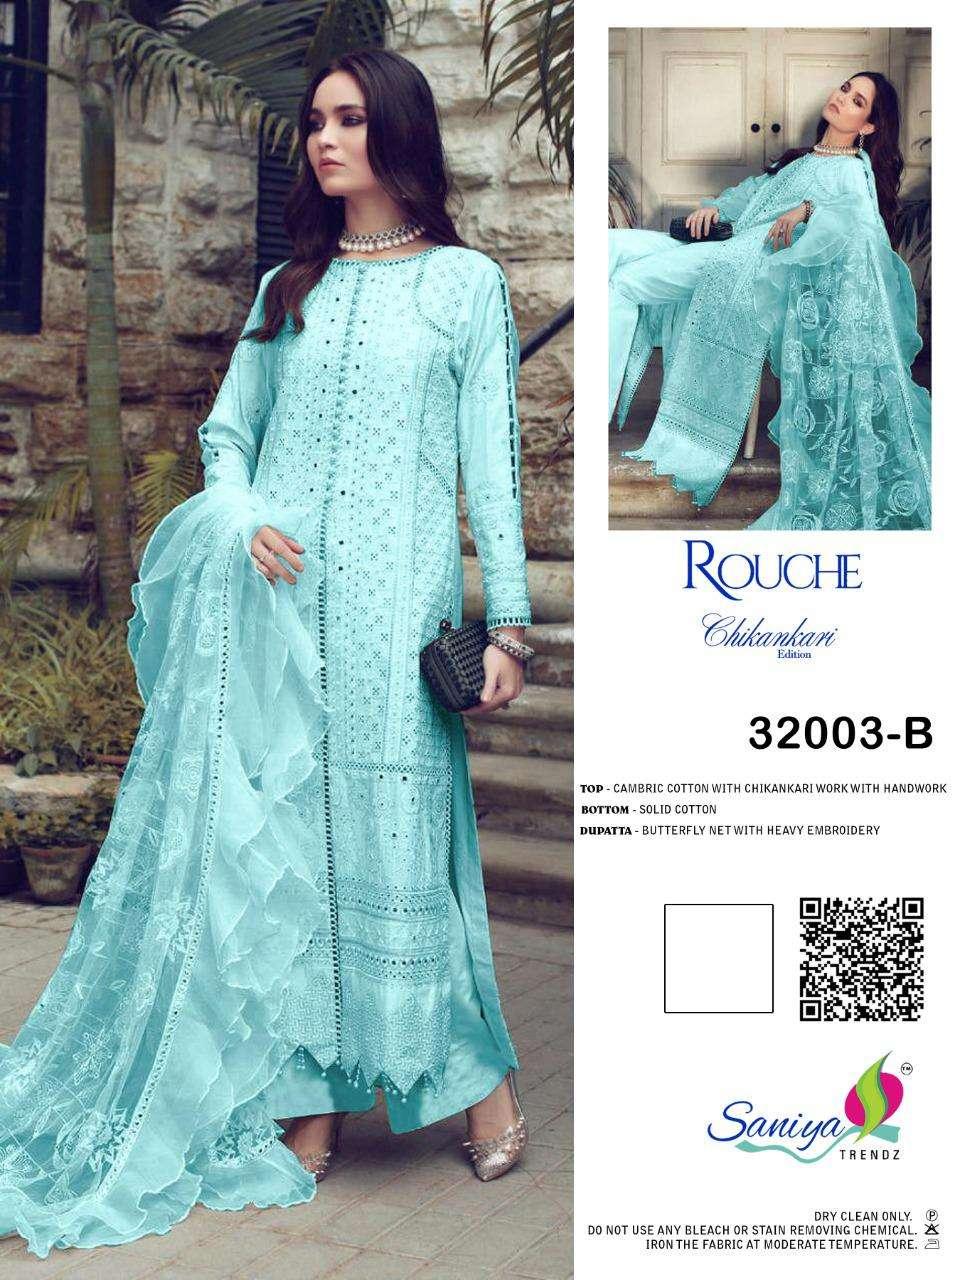 Saniya Trendz Rouch 32003 Colours Cambric Cotton Pakistani Dresses